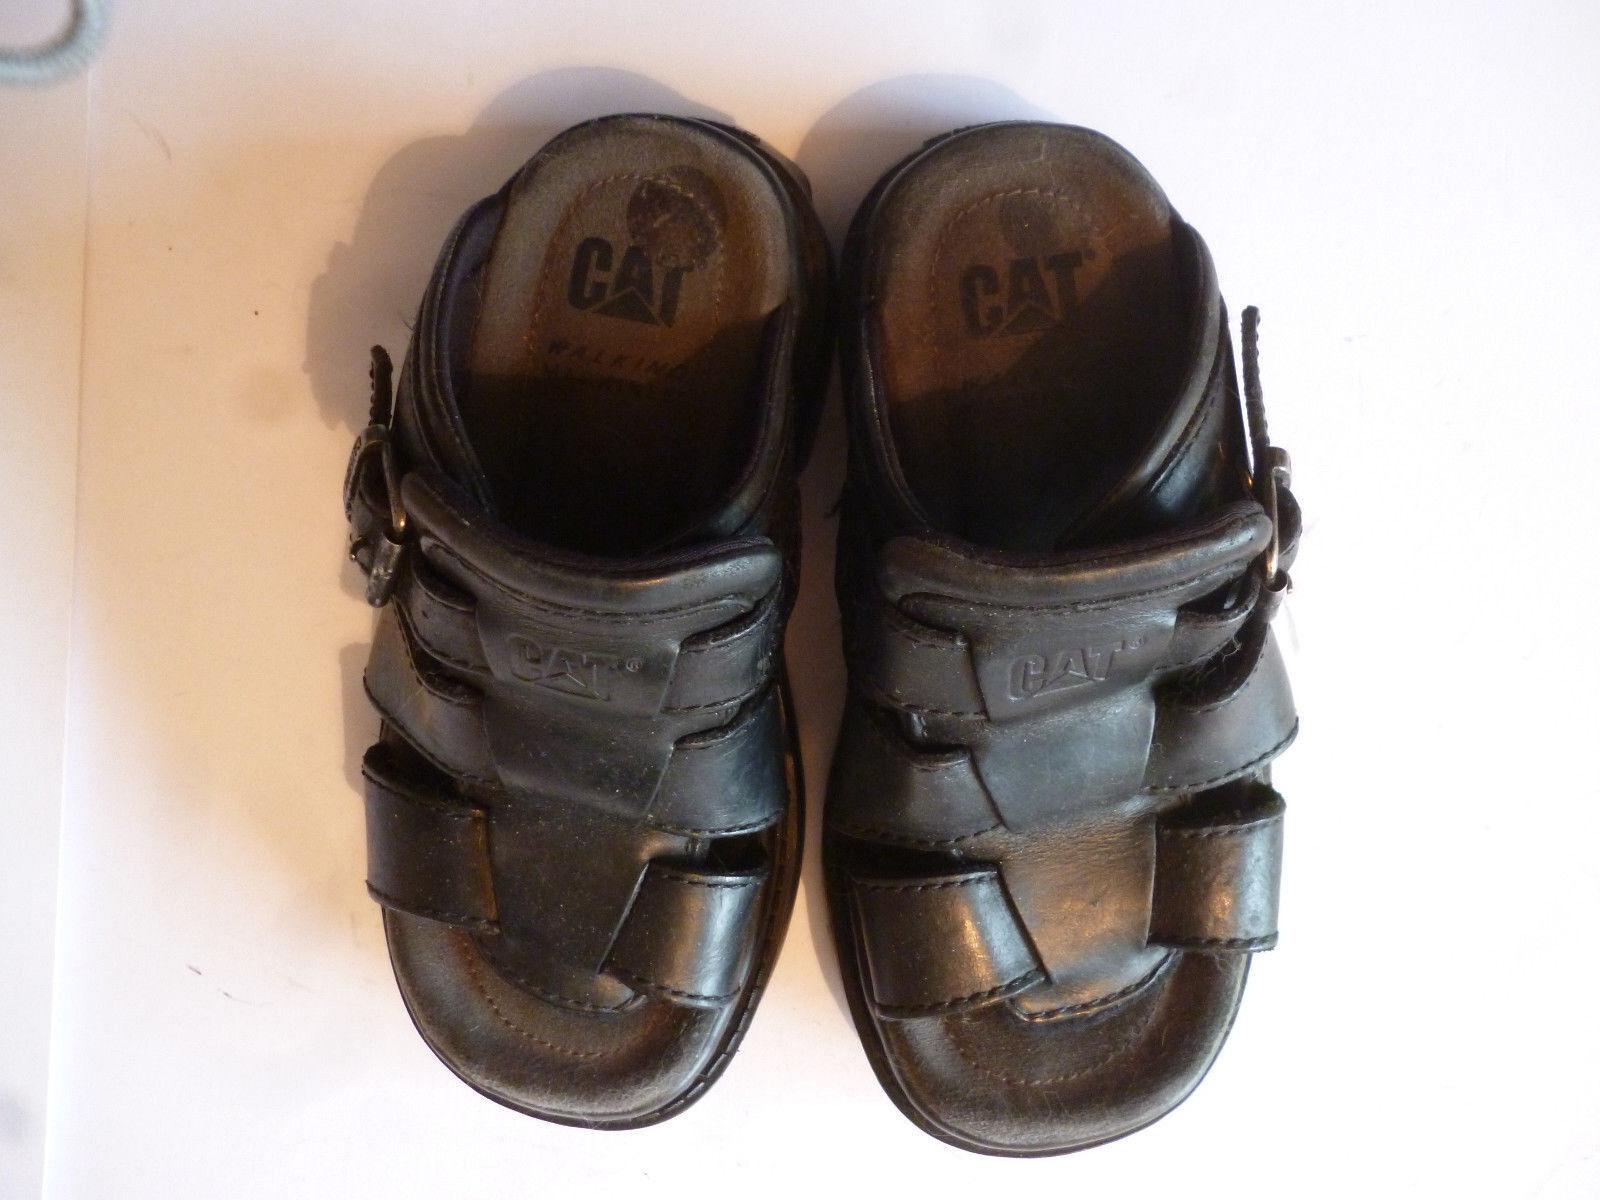 Zapatos para mujer Slip On On On Cat Caterpillar caminar máquinas UK3 ER36 Correas Ajustables  los clientes primero